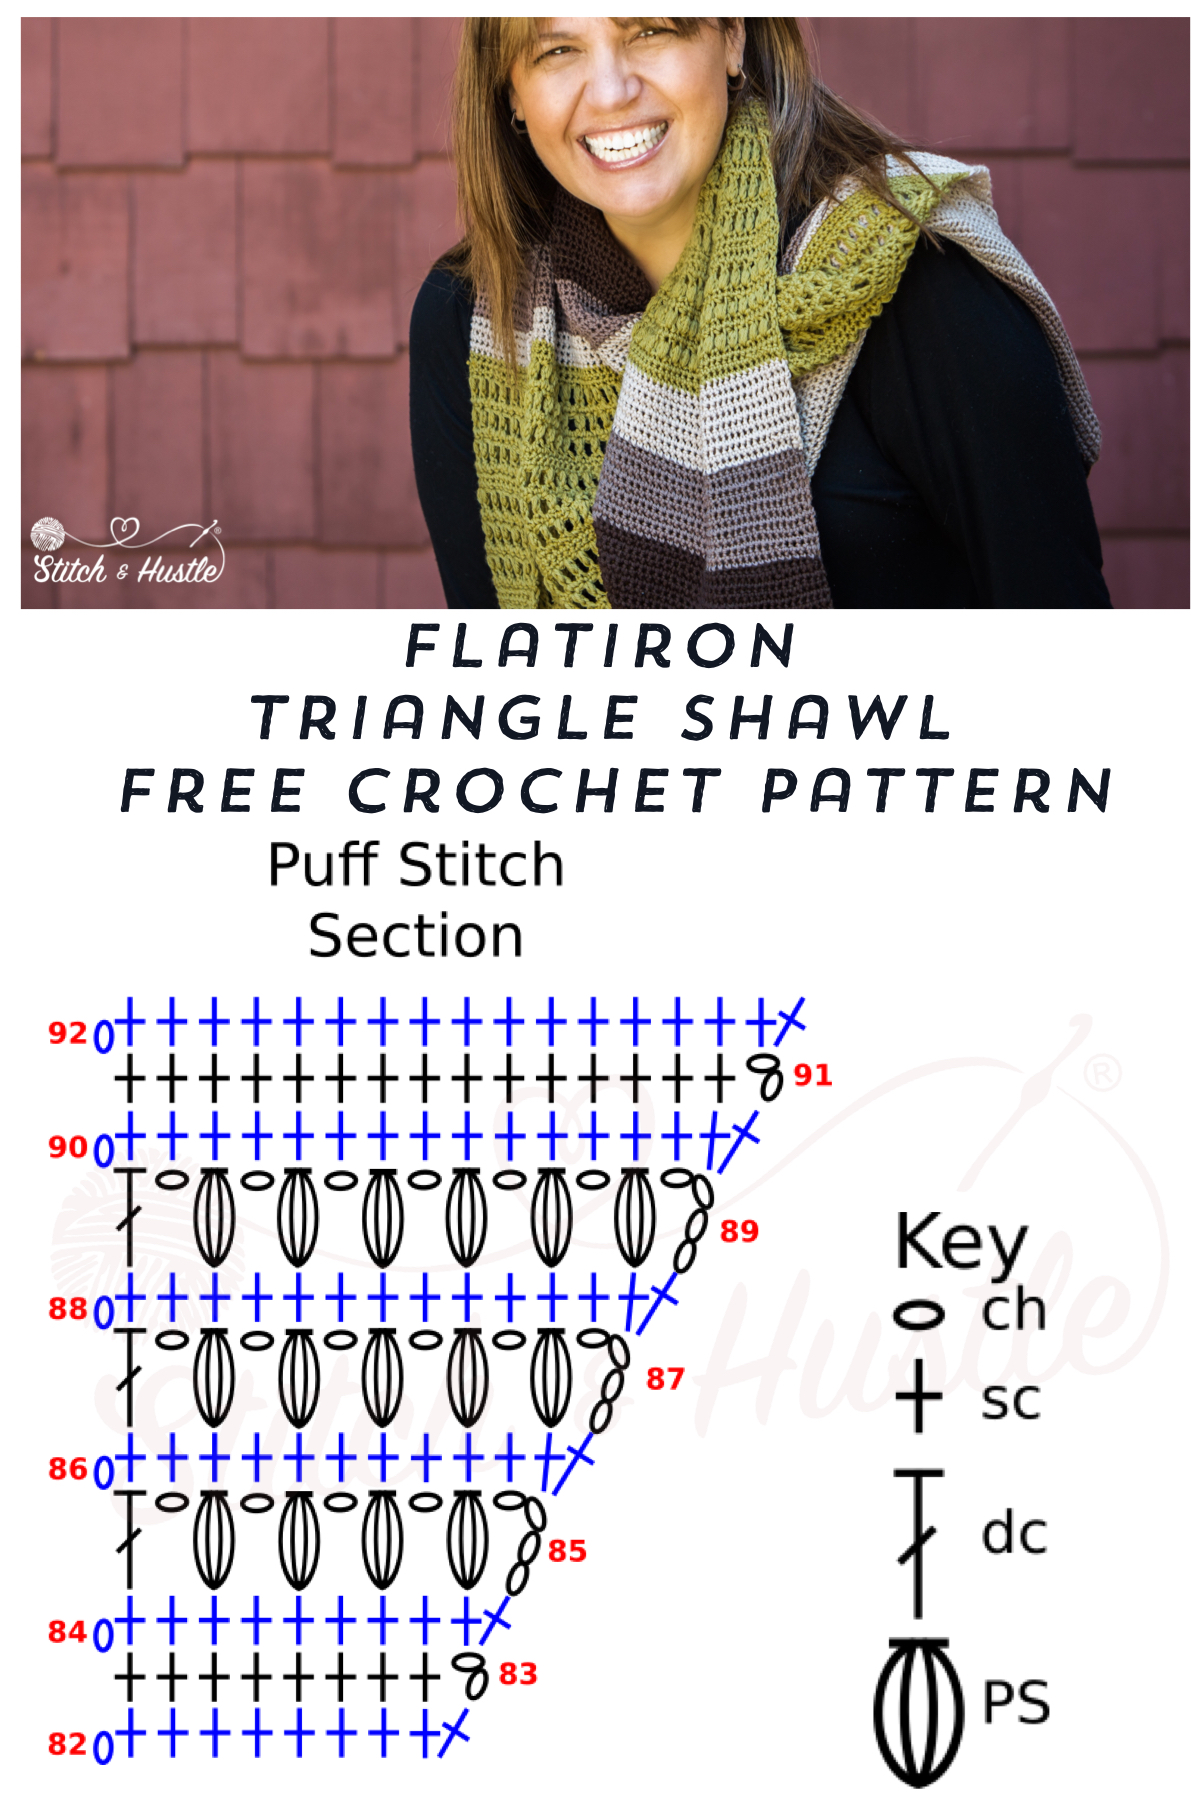 Flatiron_shawl_asymmetrical_triangle_shawl_free_crochet-pattern-chart1.jpg